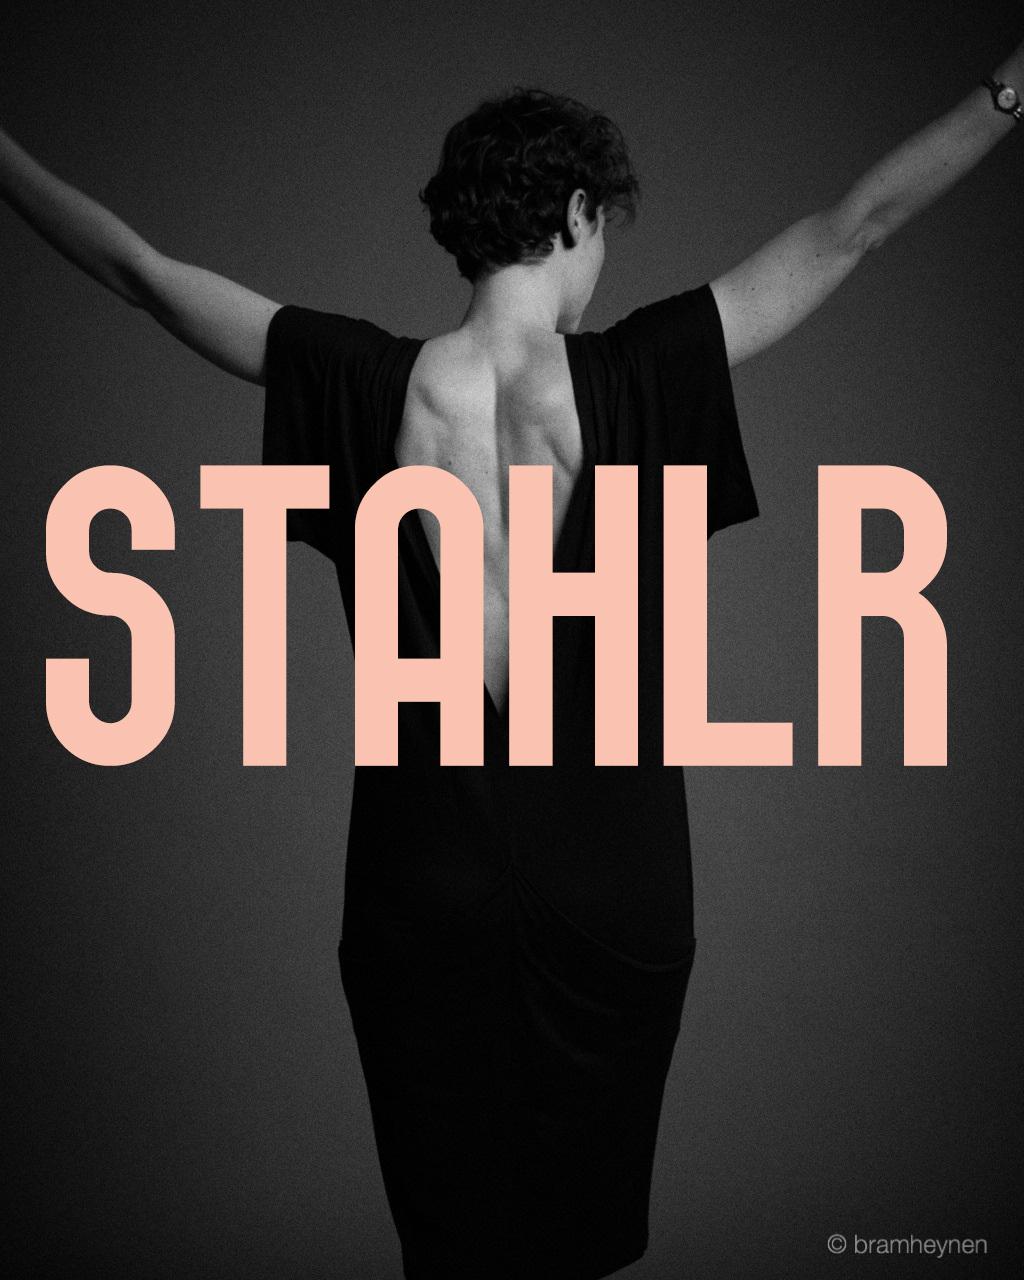 stahlr1